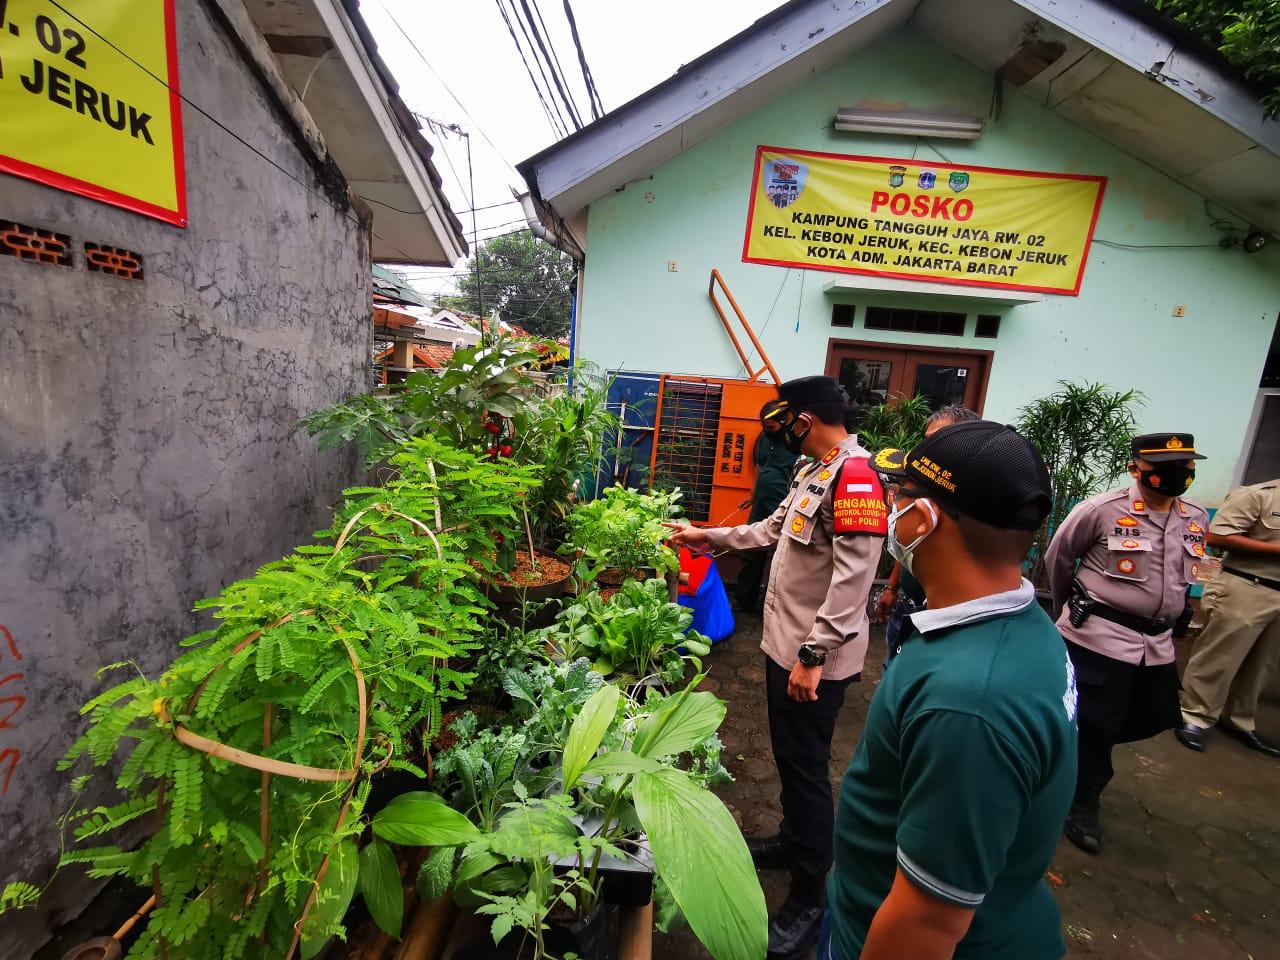 Wakapolres Metro Jakarta Barat AKBP Dr Bismo Teguh Prakoso bersama jajarannya meninjau langsung kegiatan di Kampung Tangguh Jaya di Kebon Jeruk. (Foto: PMJ News).